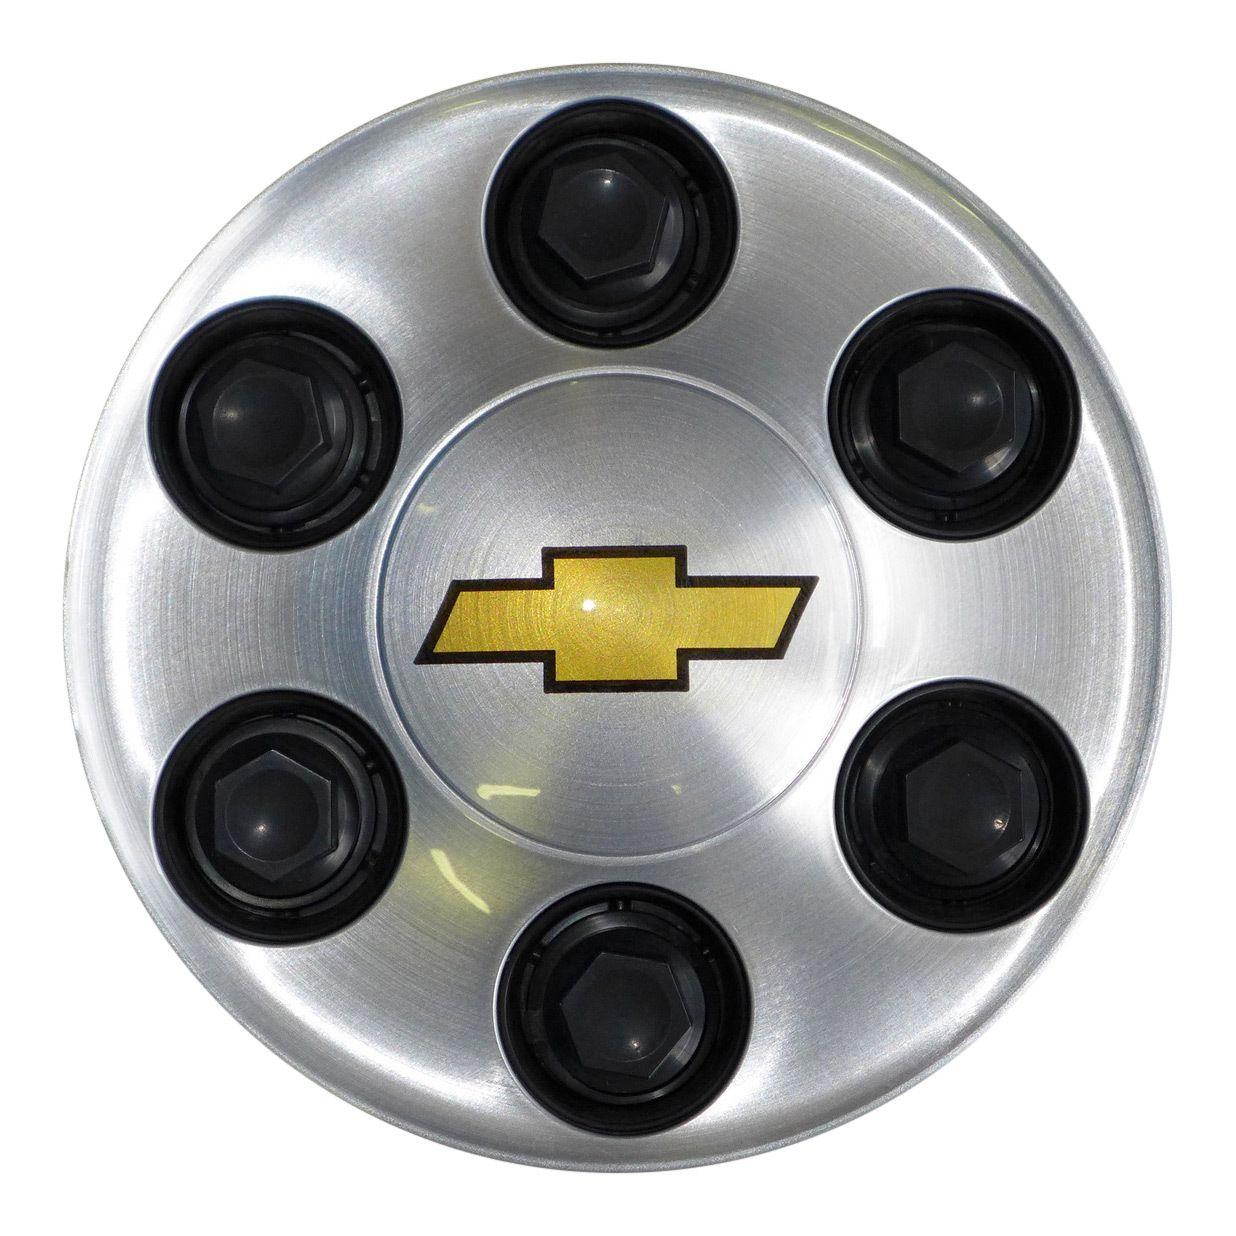 2007 2008 2009 2010 2011 2012 2013 silverado suburban 1500 tahoe hubcap rim center cap wheel cover 9595469 average